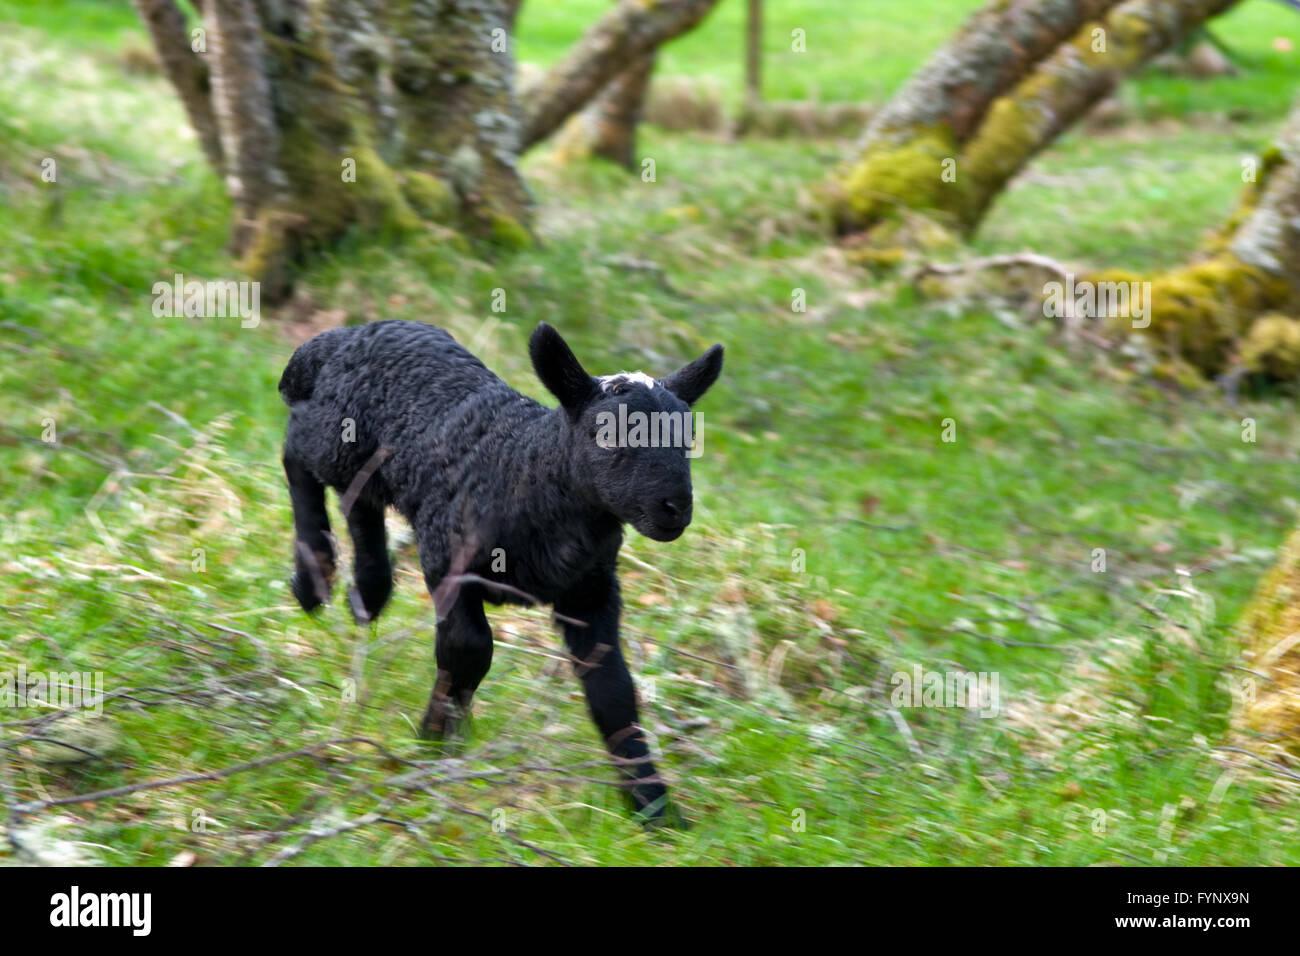 New born black lambs running in woodland, taken in spring in Scotland - Stock Image